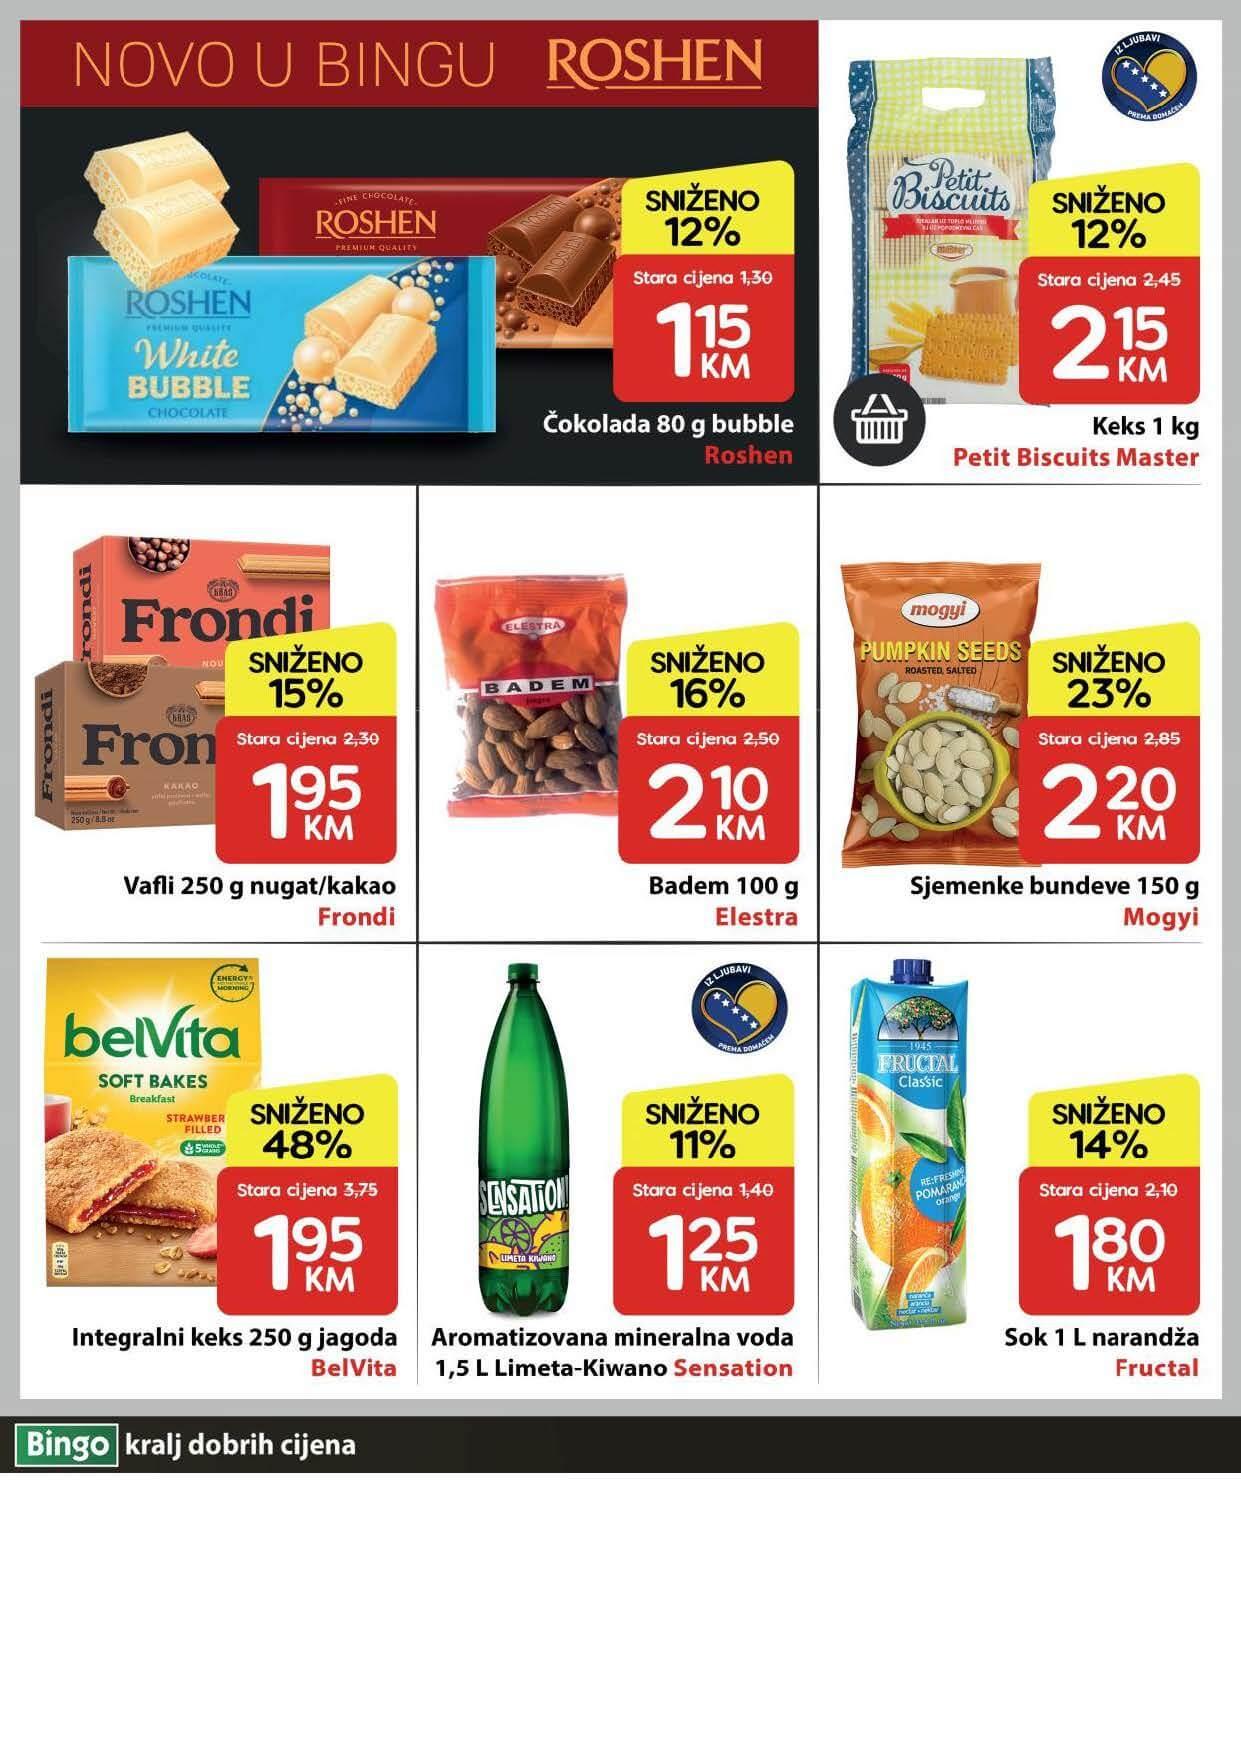 BINGO Katalog U Bingu vikend akcija traje cetiri dana JUN 2021 17.6. 20.6. eKatalozi.com PR Page 4